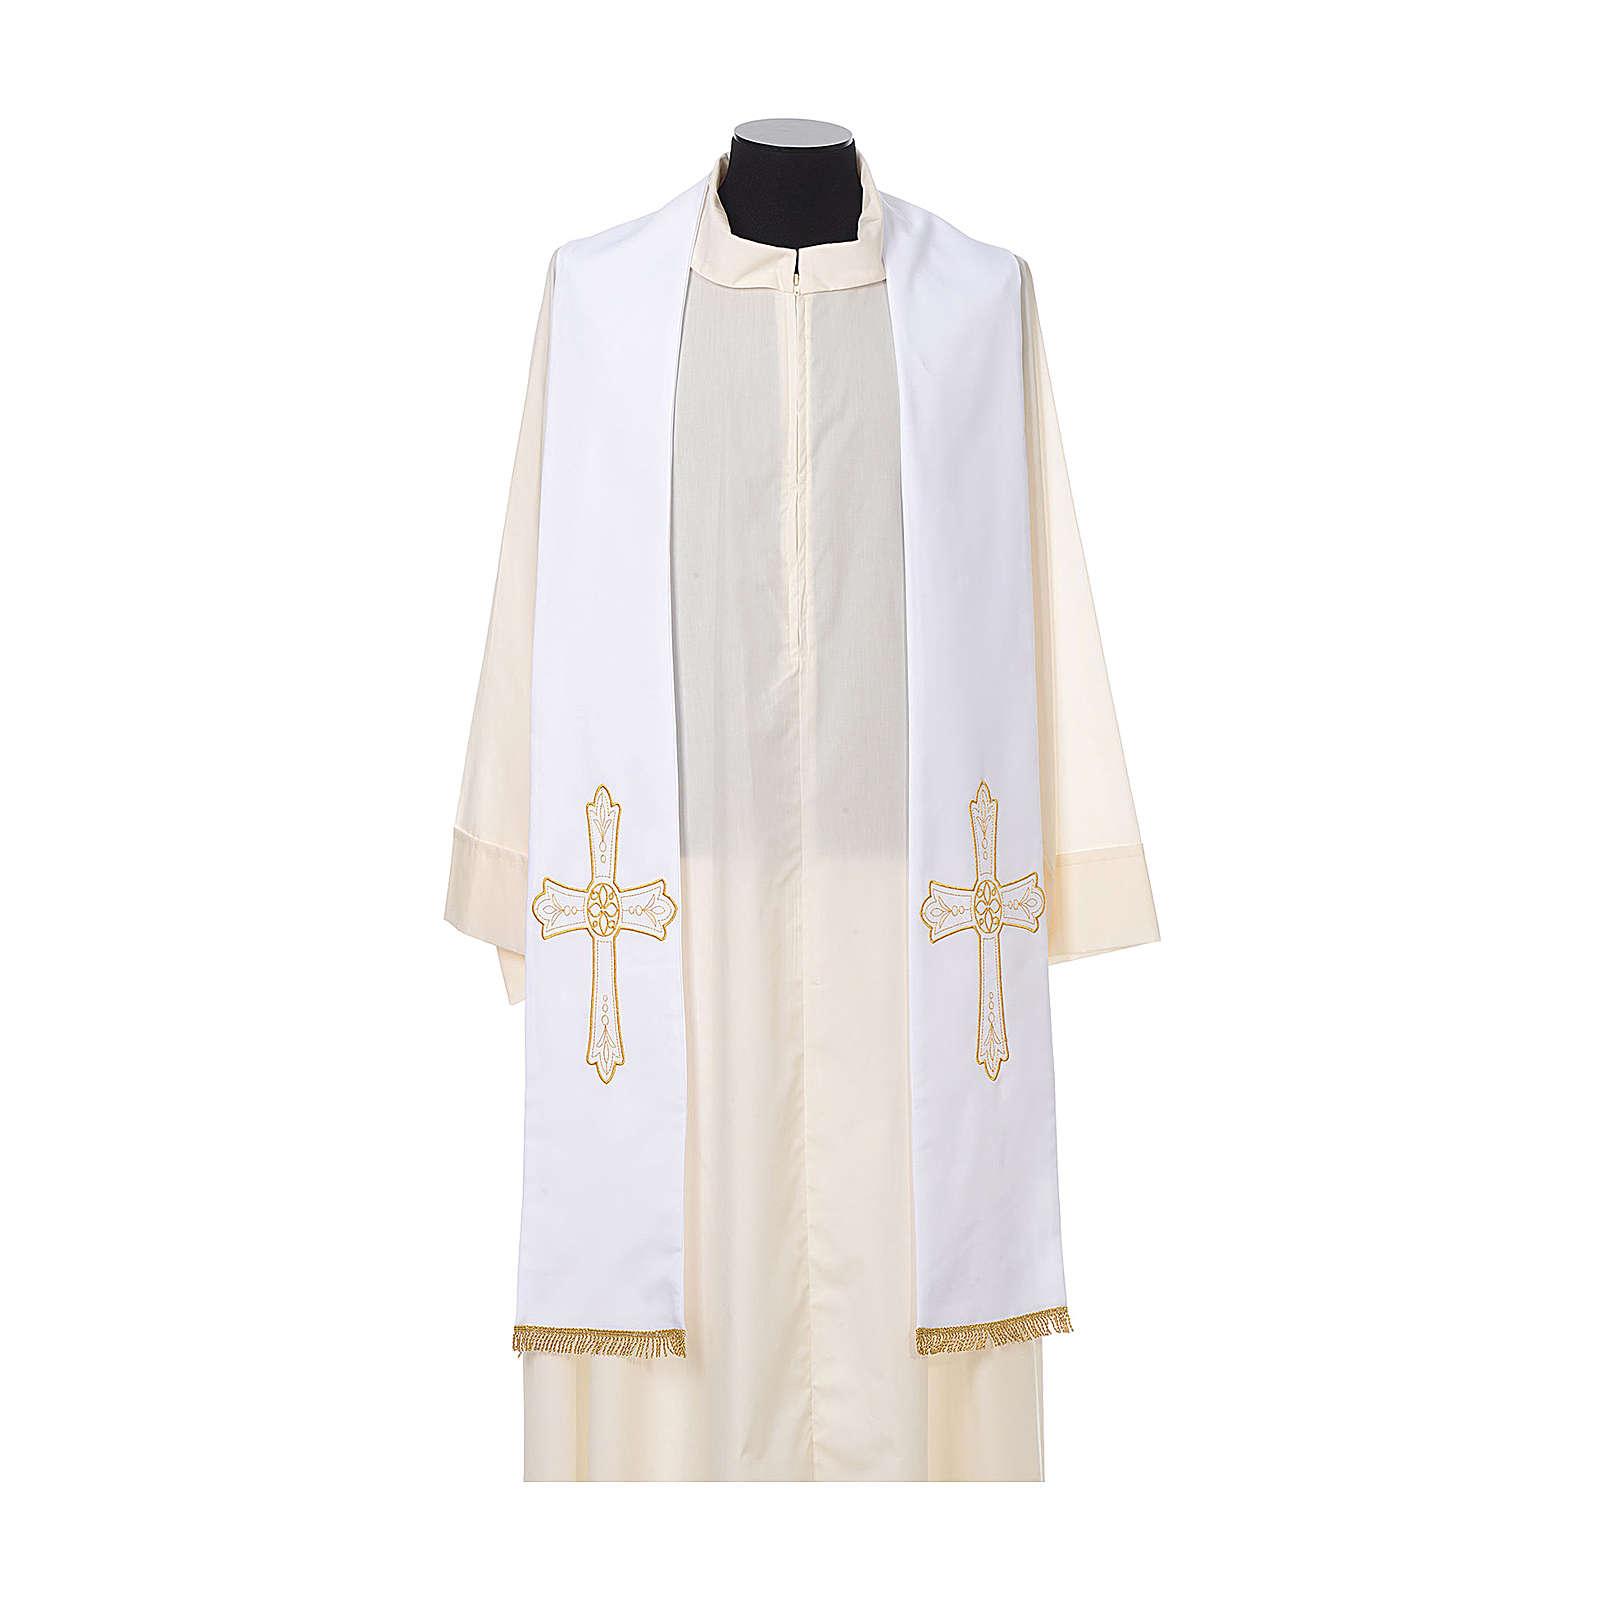 Estola sacerdotal bordado dorado cruz doble cara 100% poliéster 4